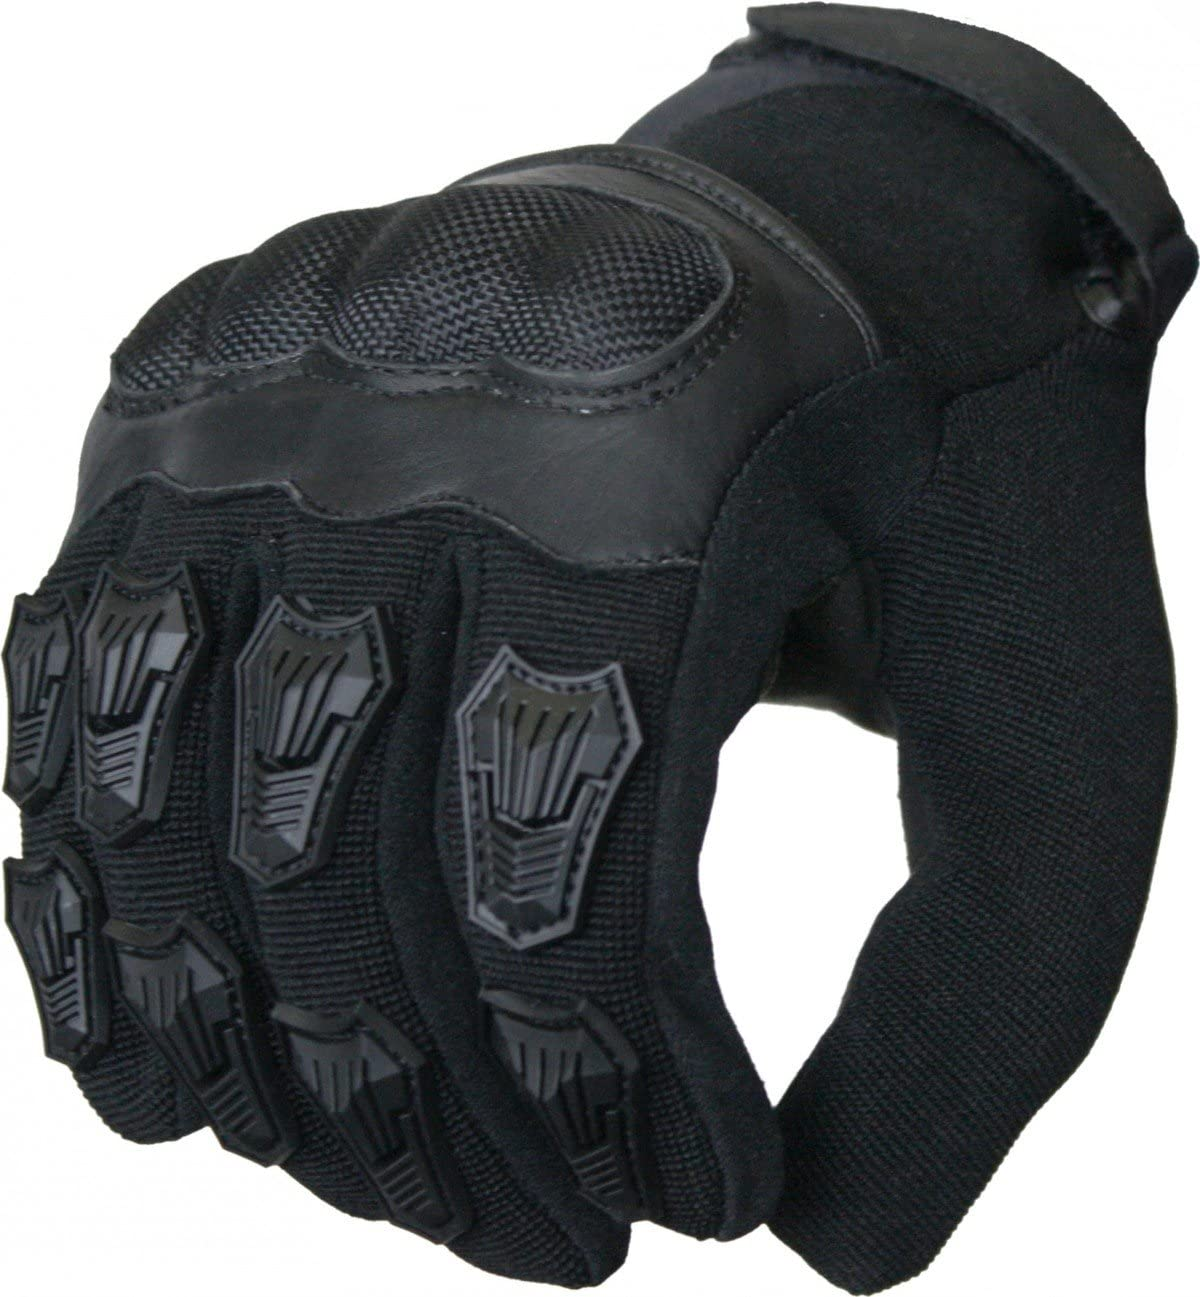 Size:8=M German Wear Motorradhandschuhe Sommer Motorrad Biker Handschuhe Schwarz